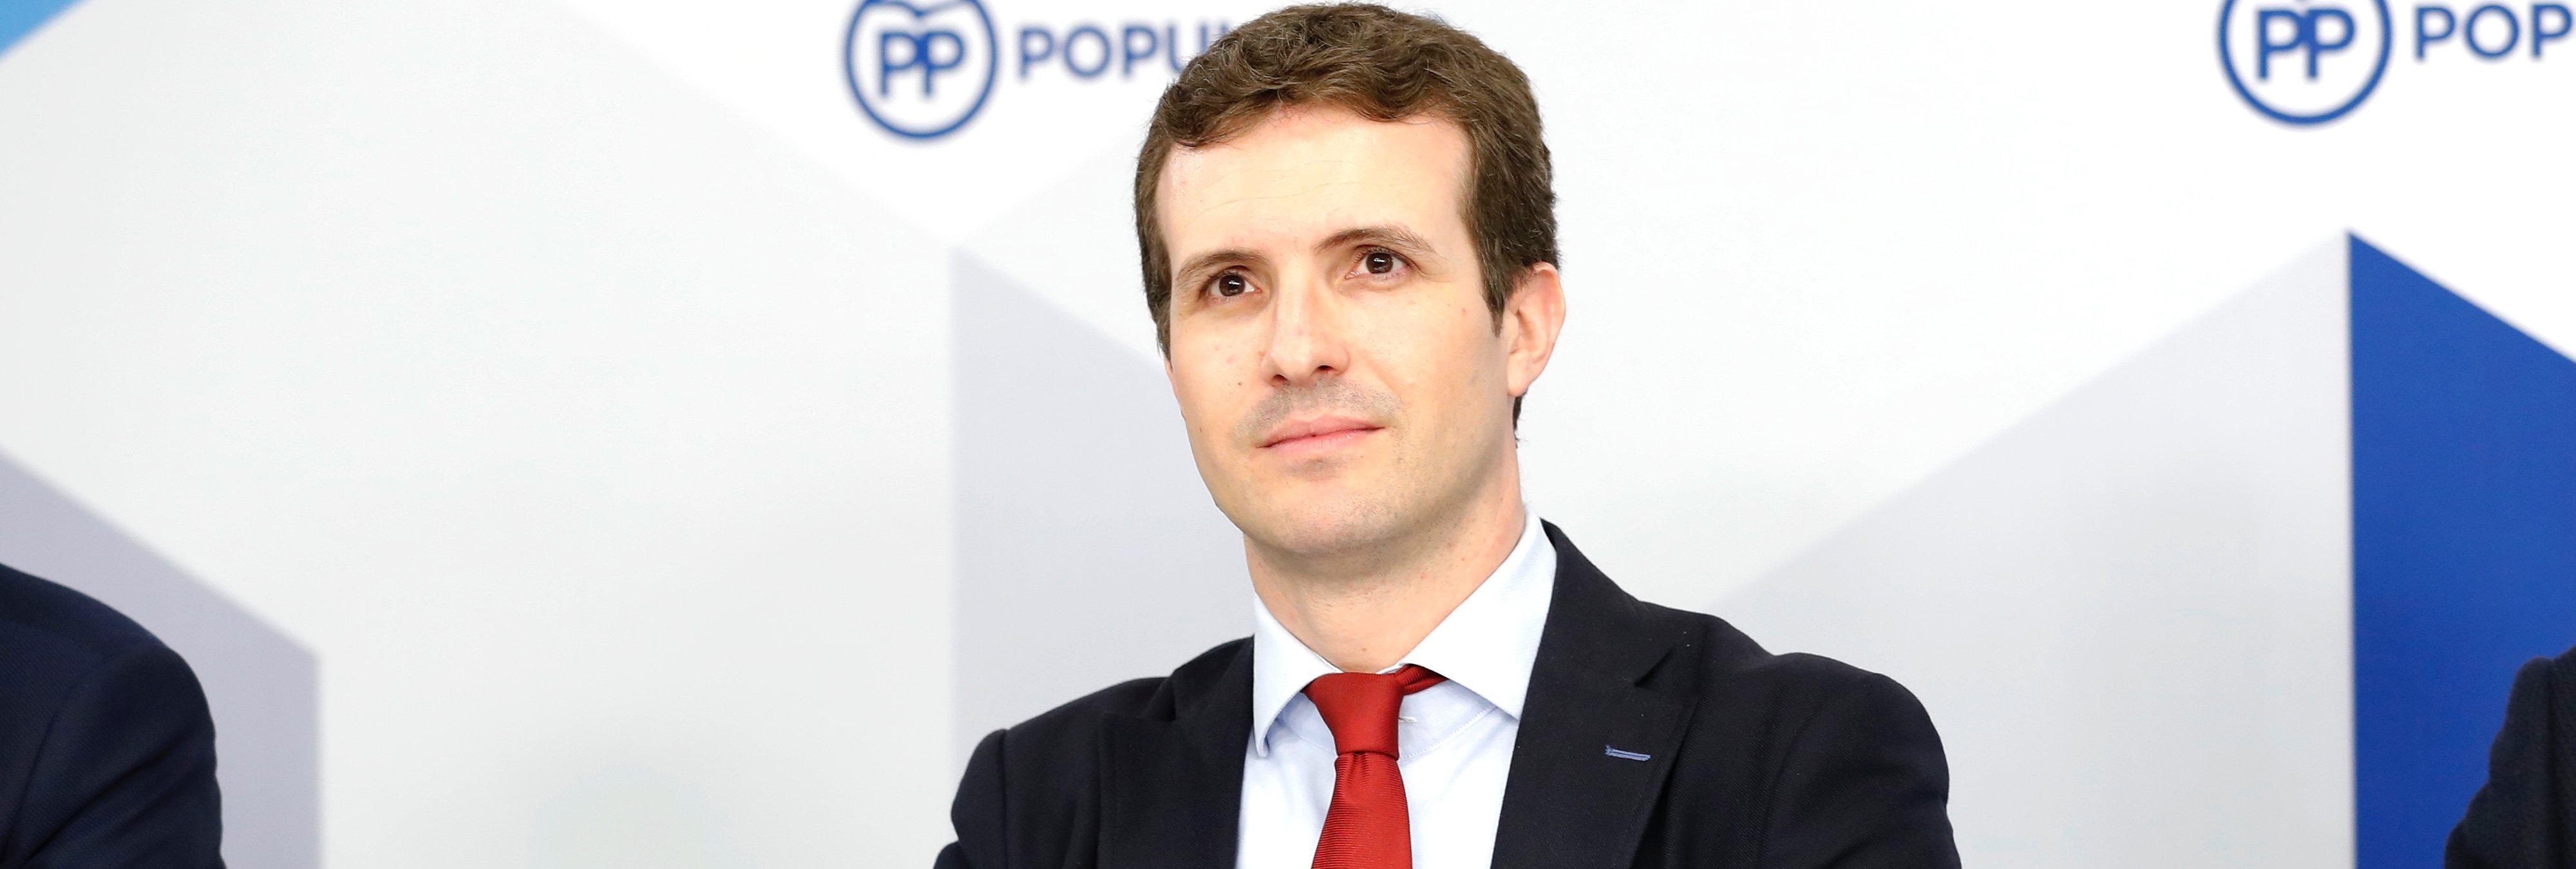 "Pablo Casado: ""Presento mi candidatura para recuperar a aquellos votantes que se han ido a C's o VOX"""